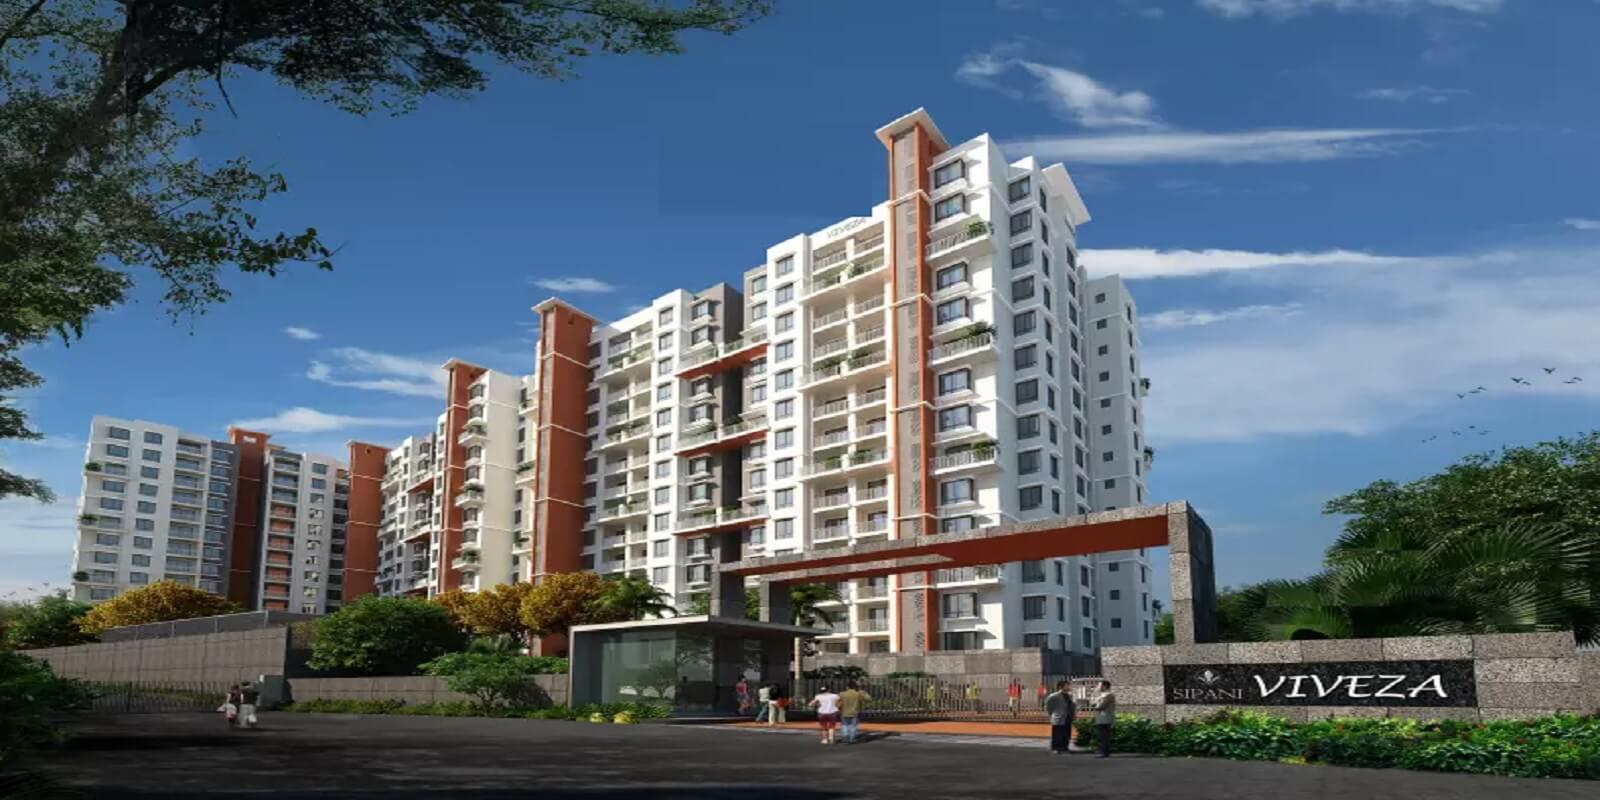 sipani veiveza project large image1